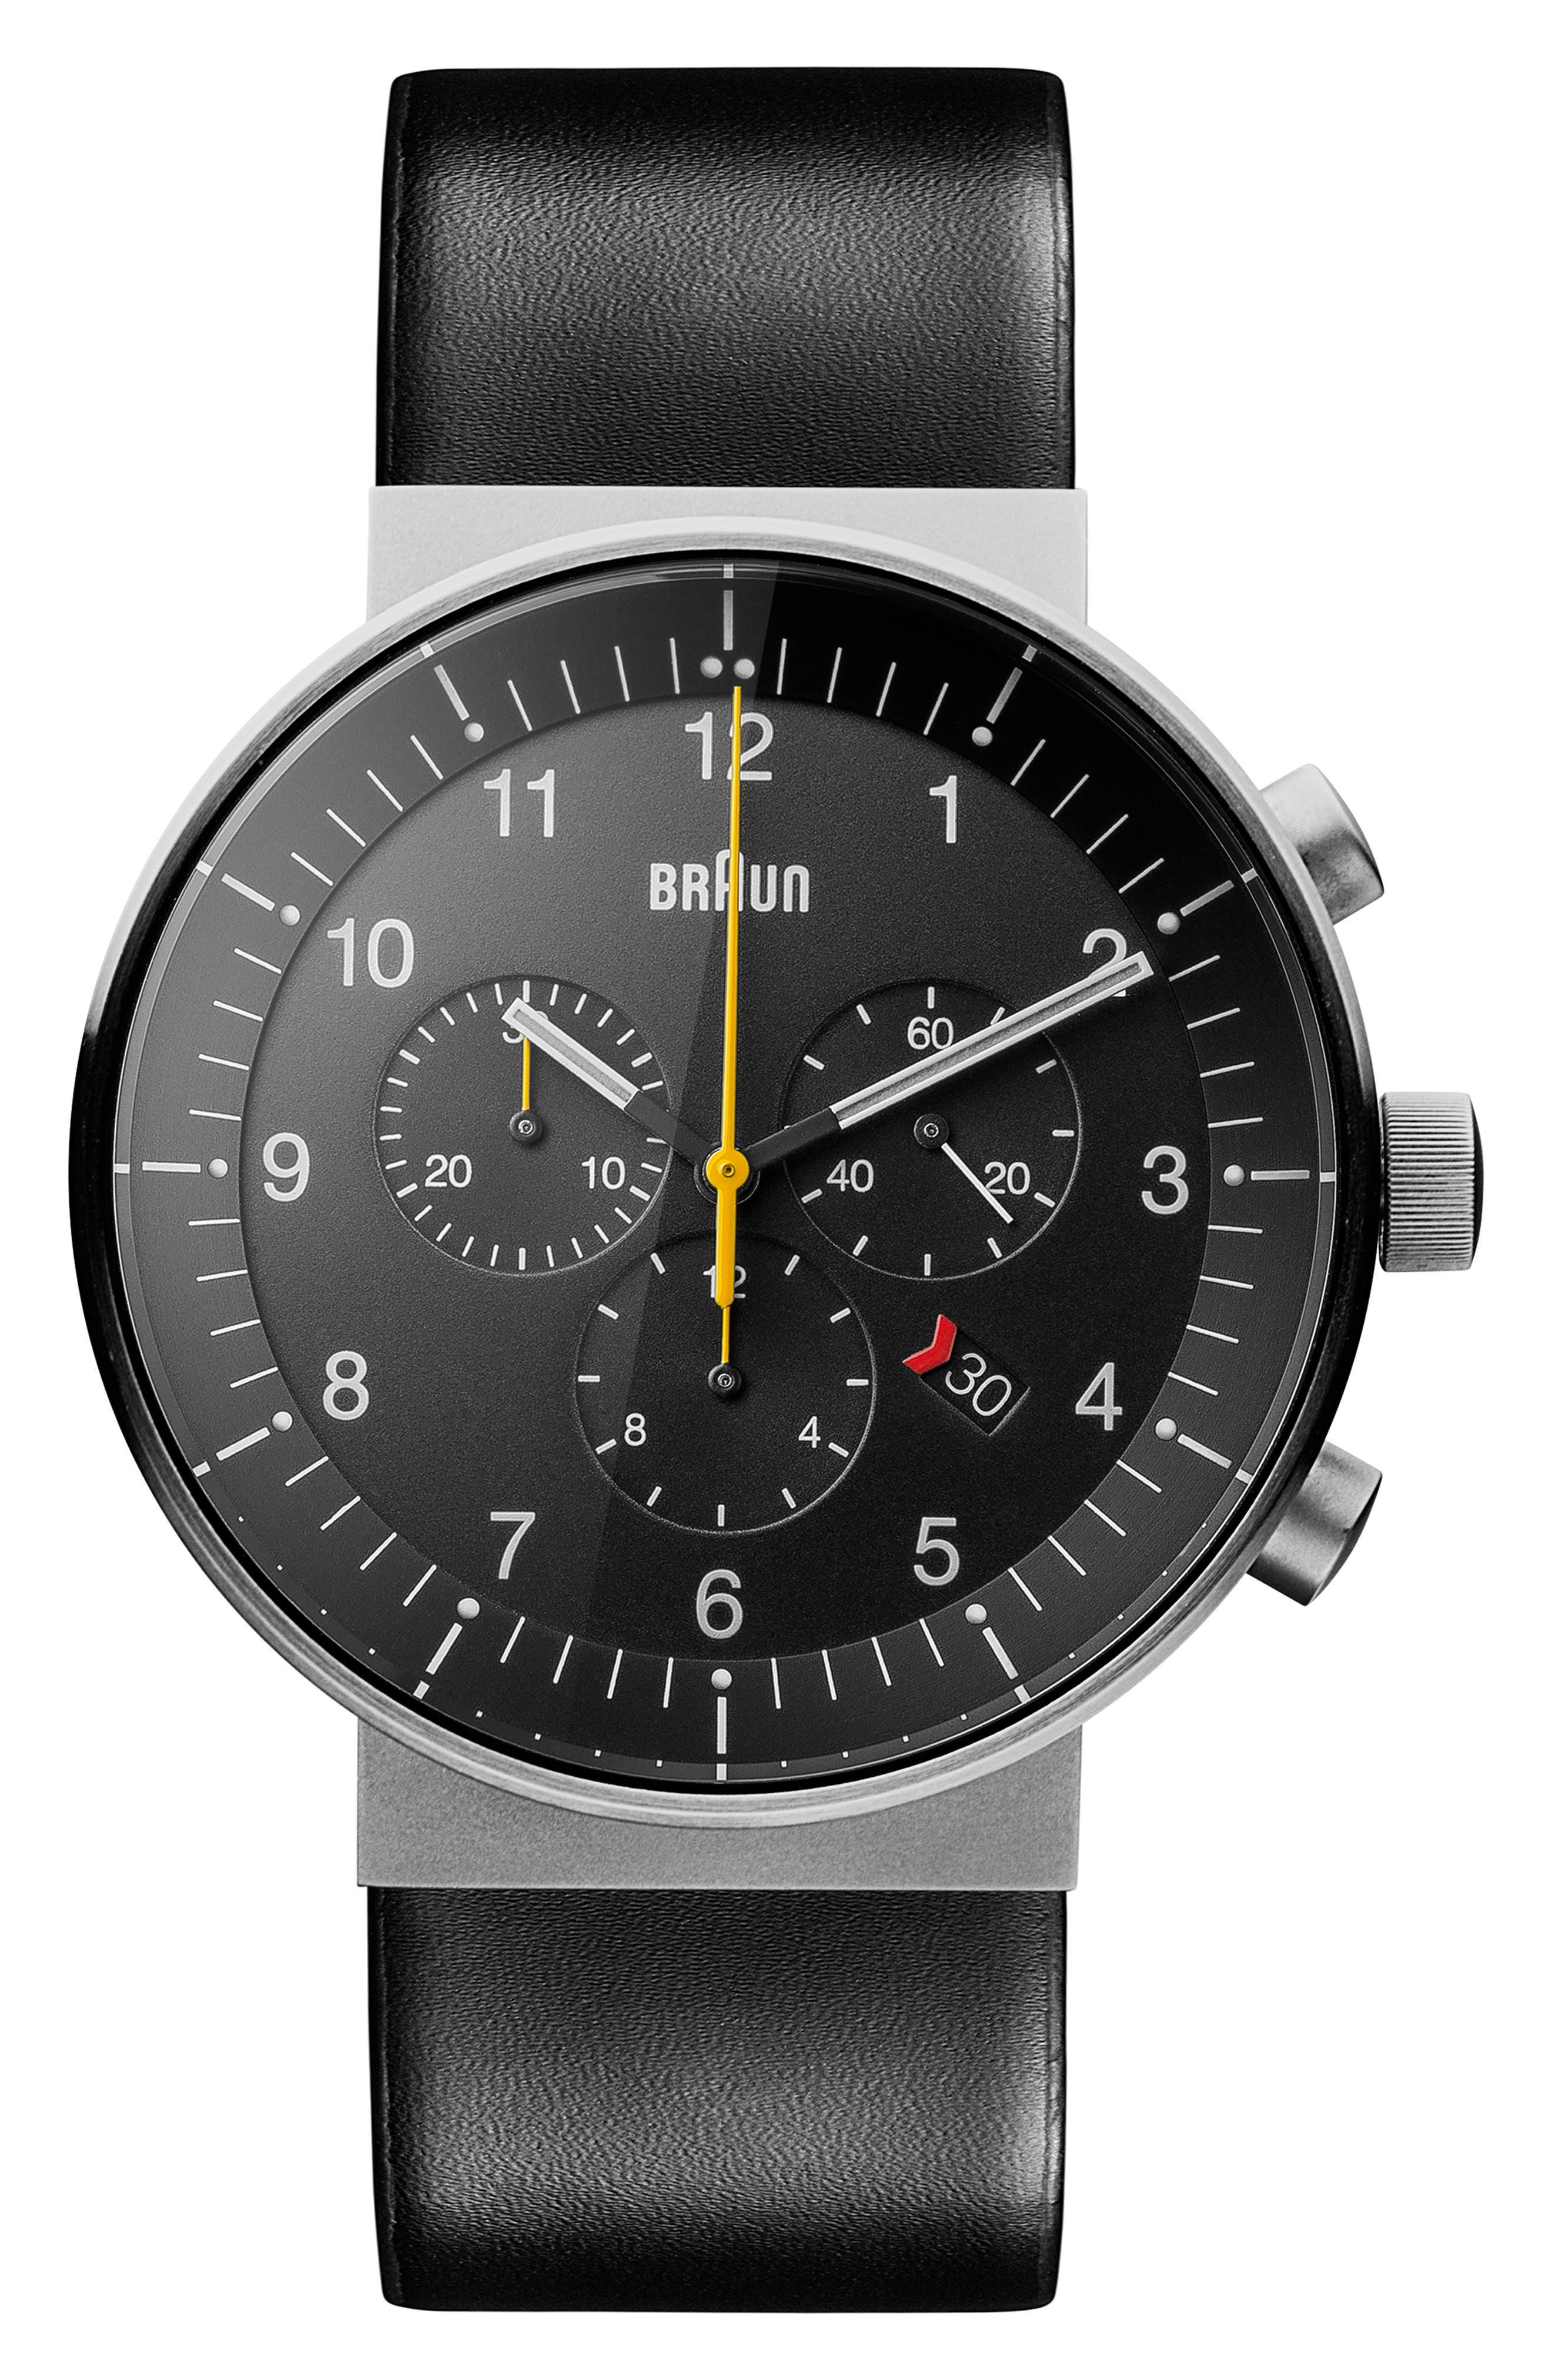 BRAUN Prestige Chronograph Leather Strap Watch, 43Mm in Black/ Silver